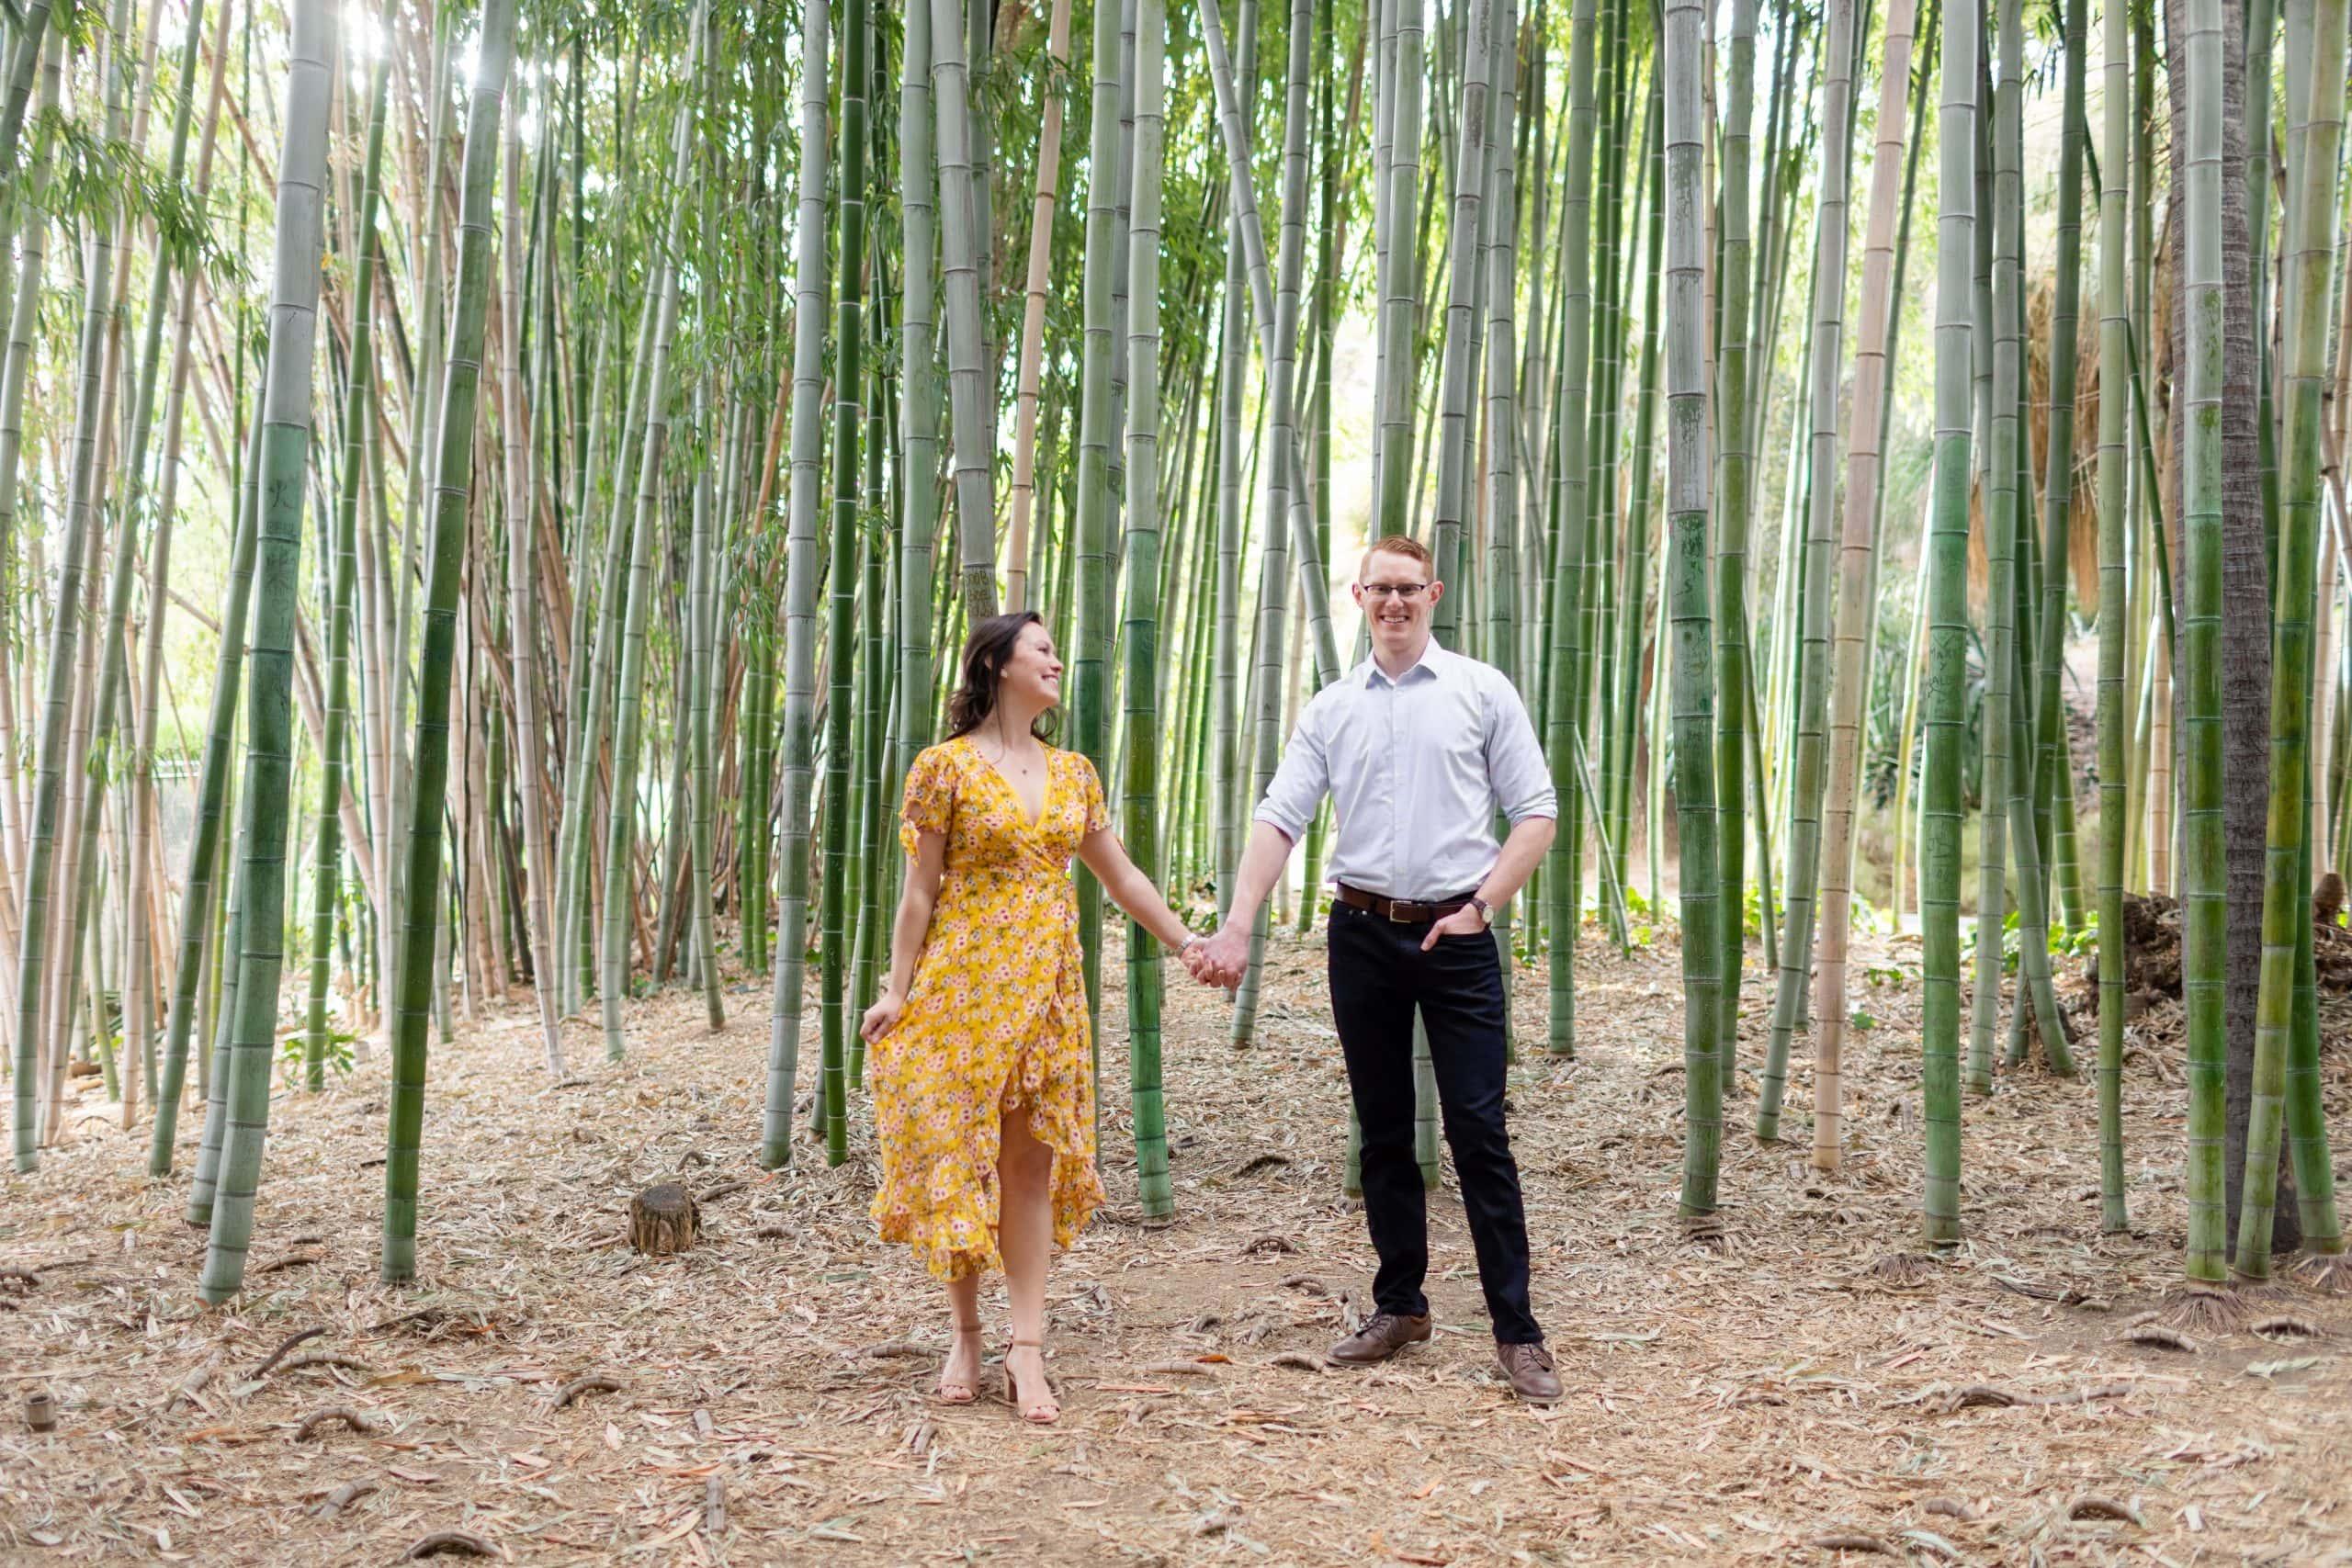 los angeles arboretum engagement photos bamboo